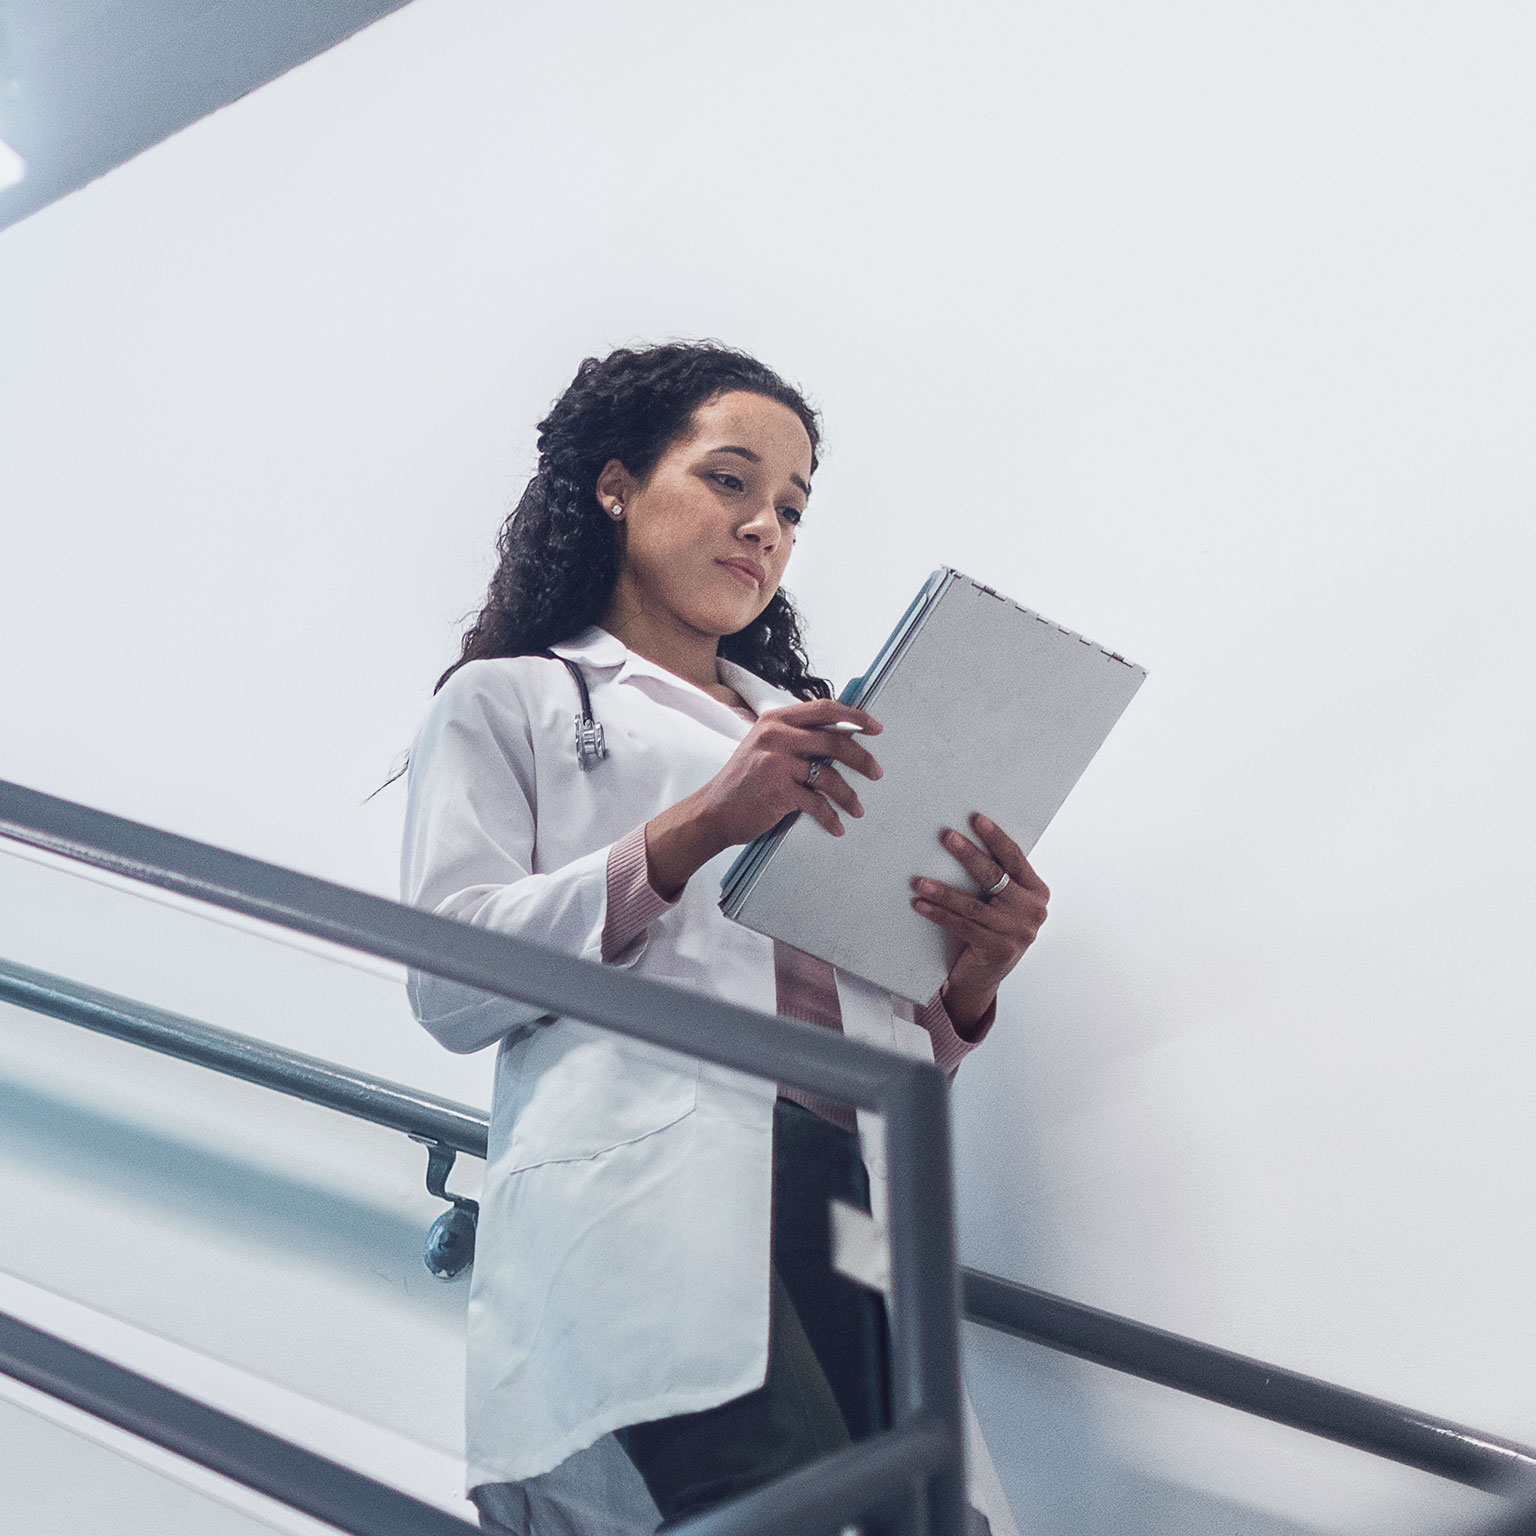 Women in the healthcare industry